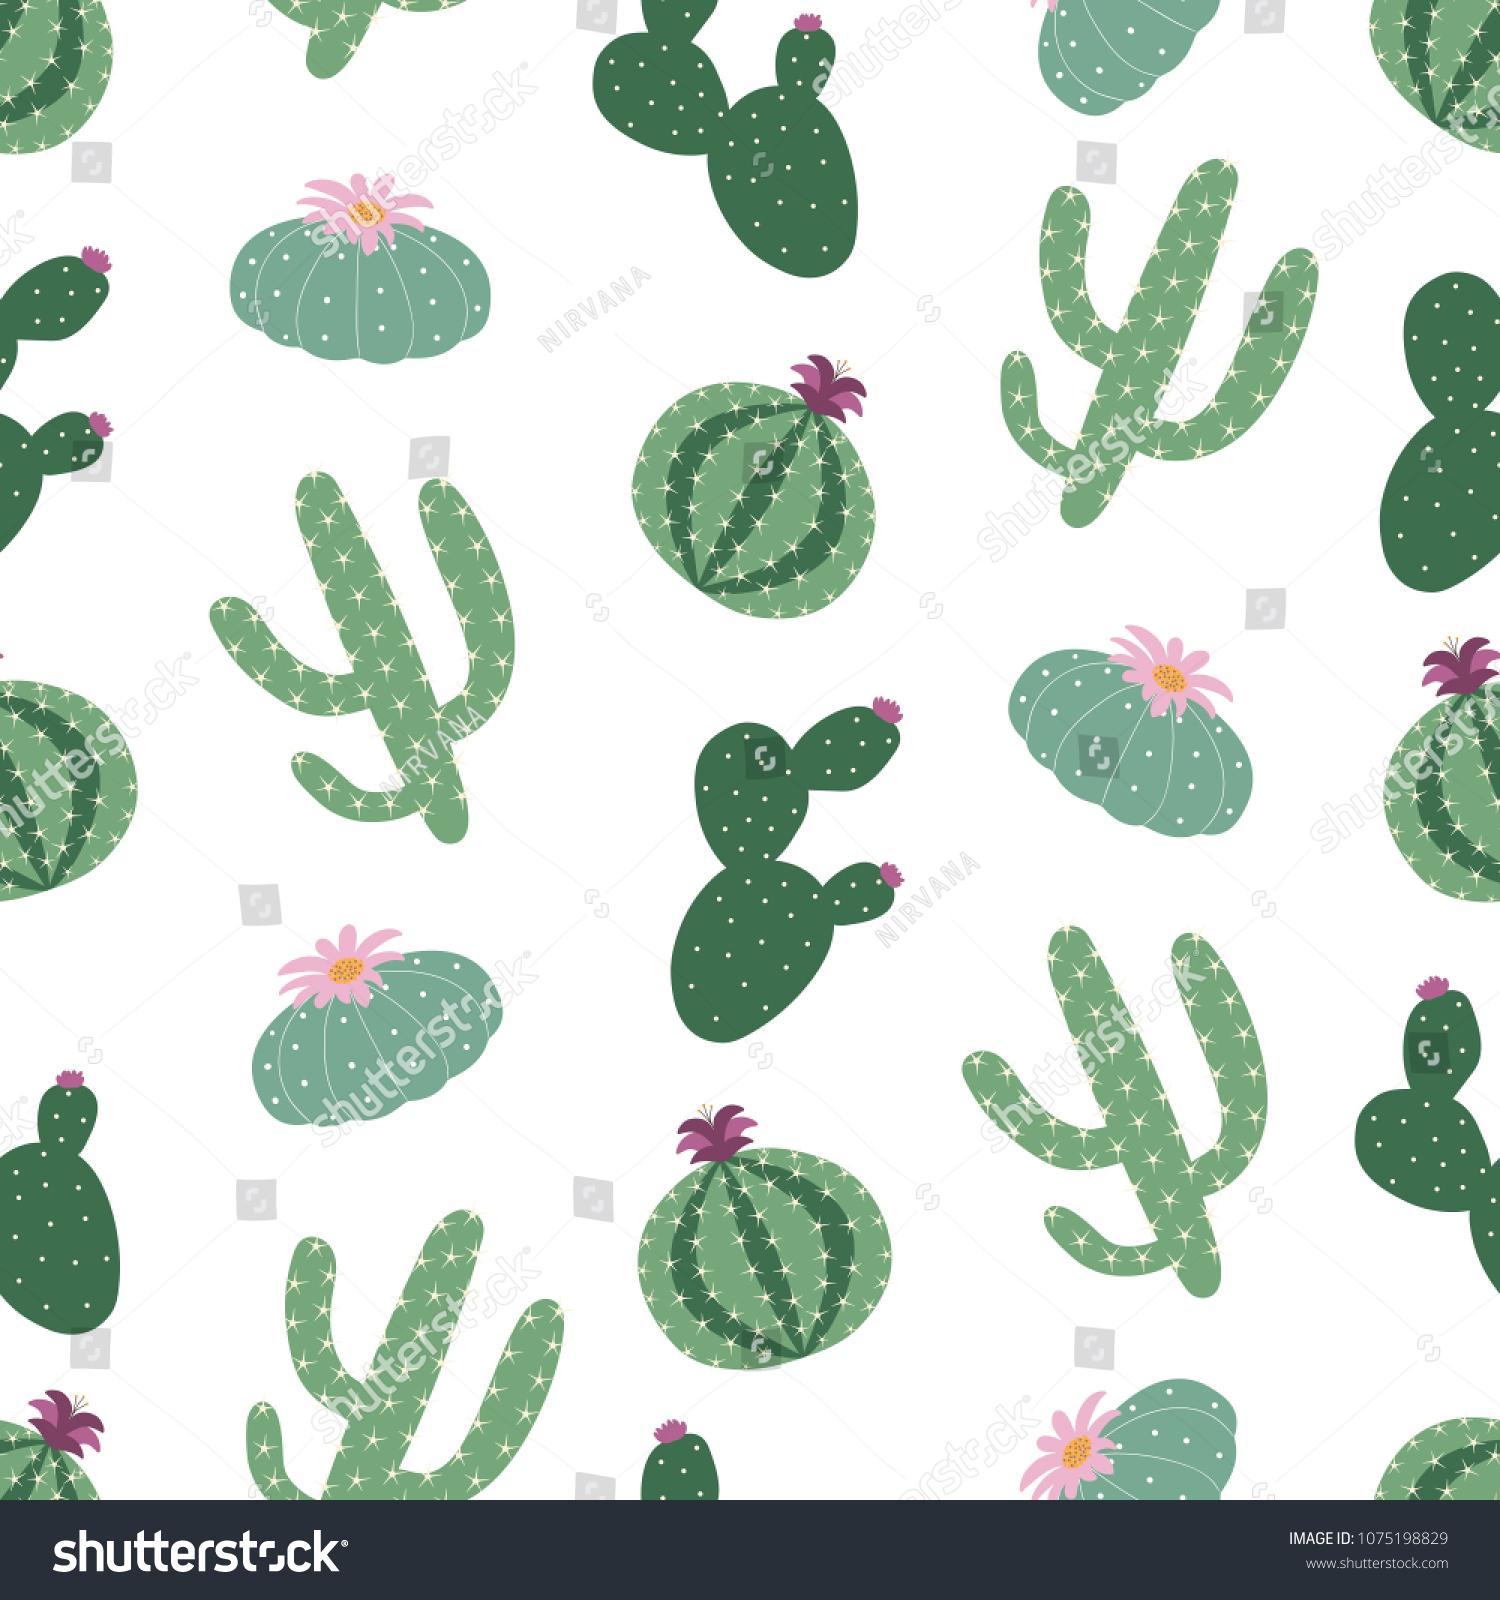 Green Plants Cactus Peyote Seamless Pattern Stock Illustration 1500x1600